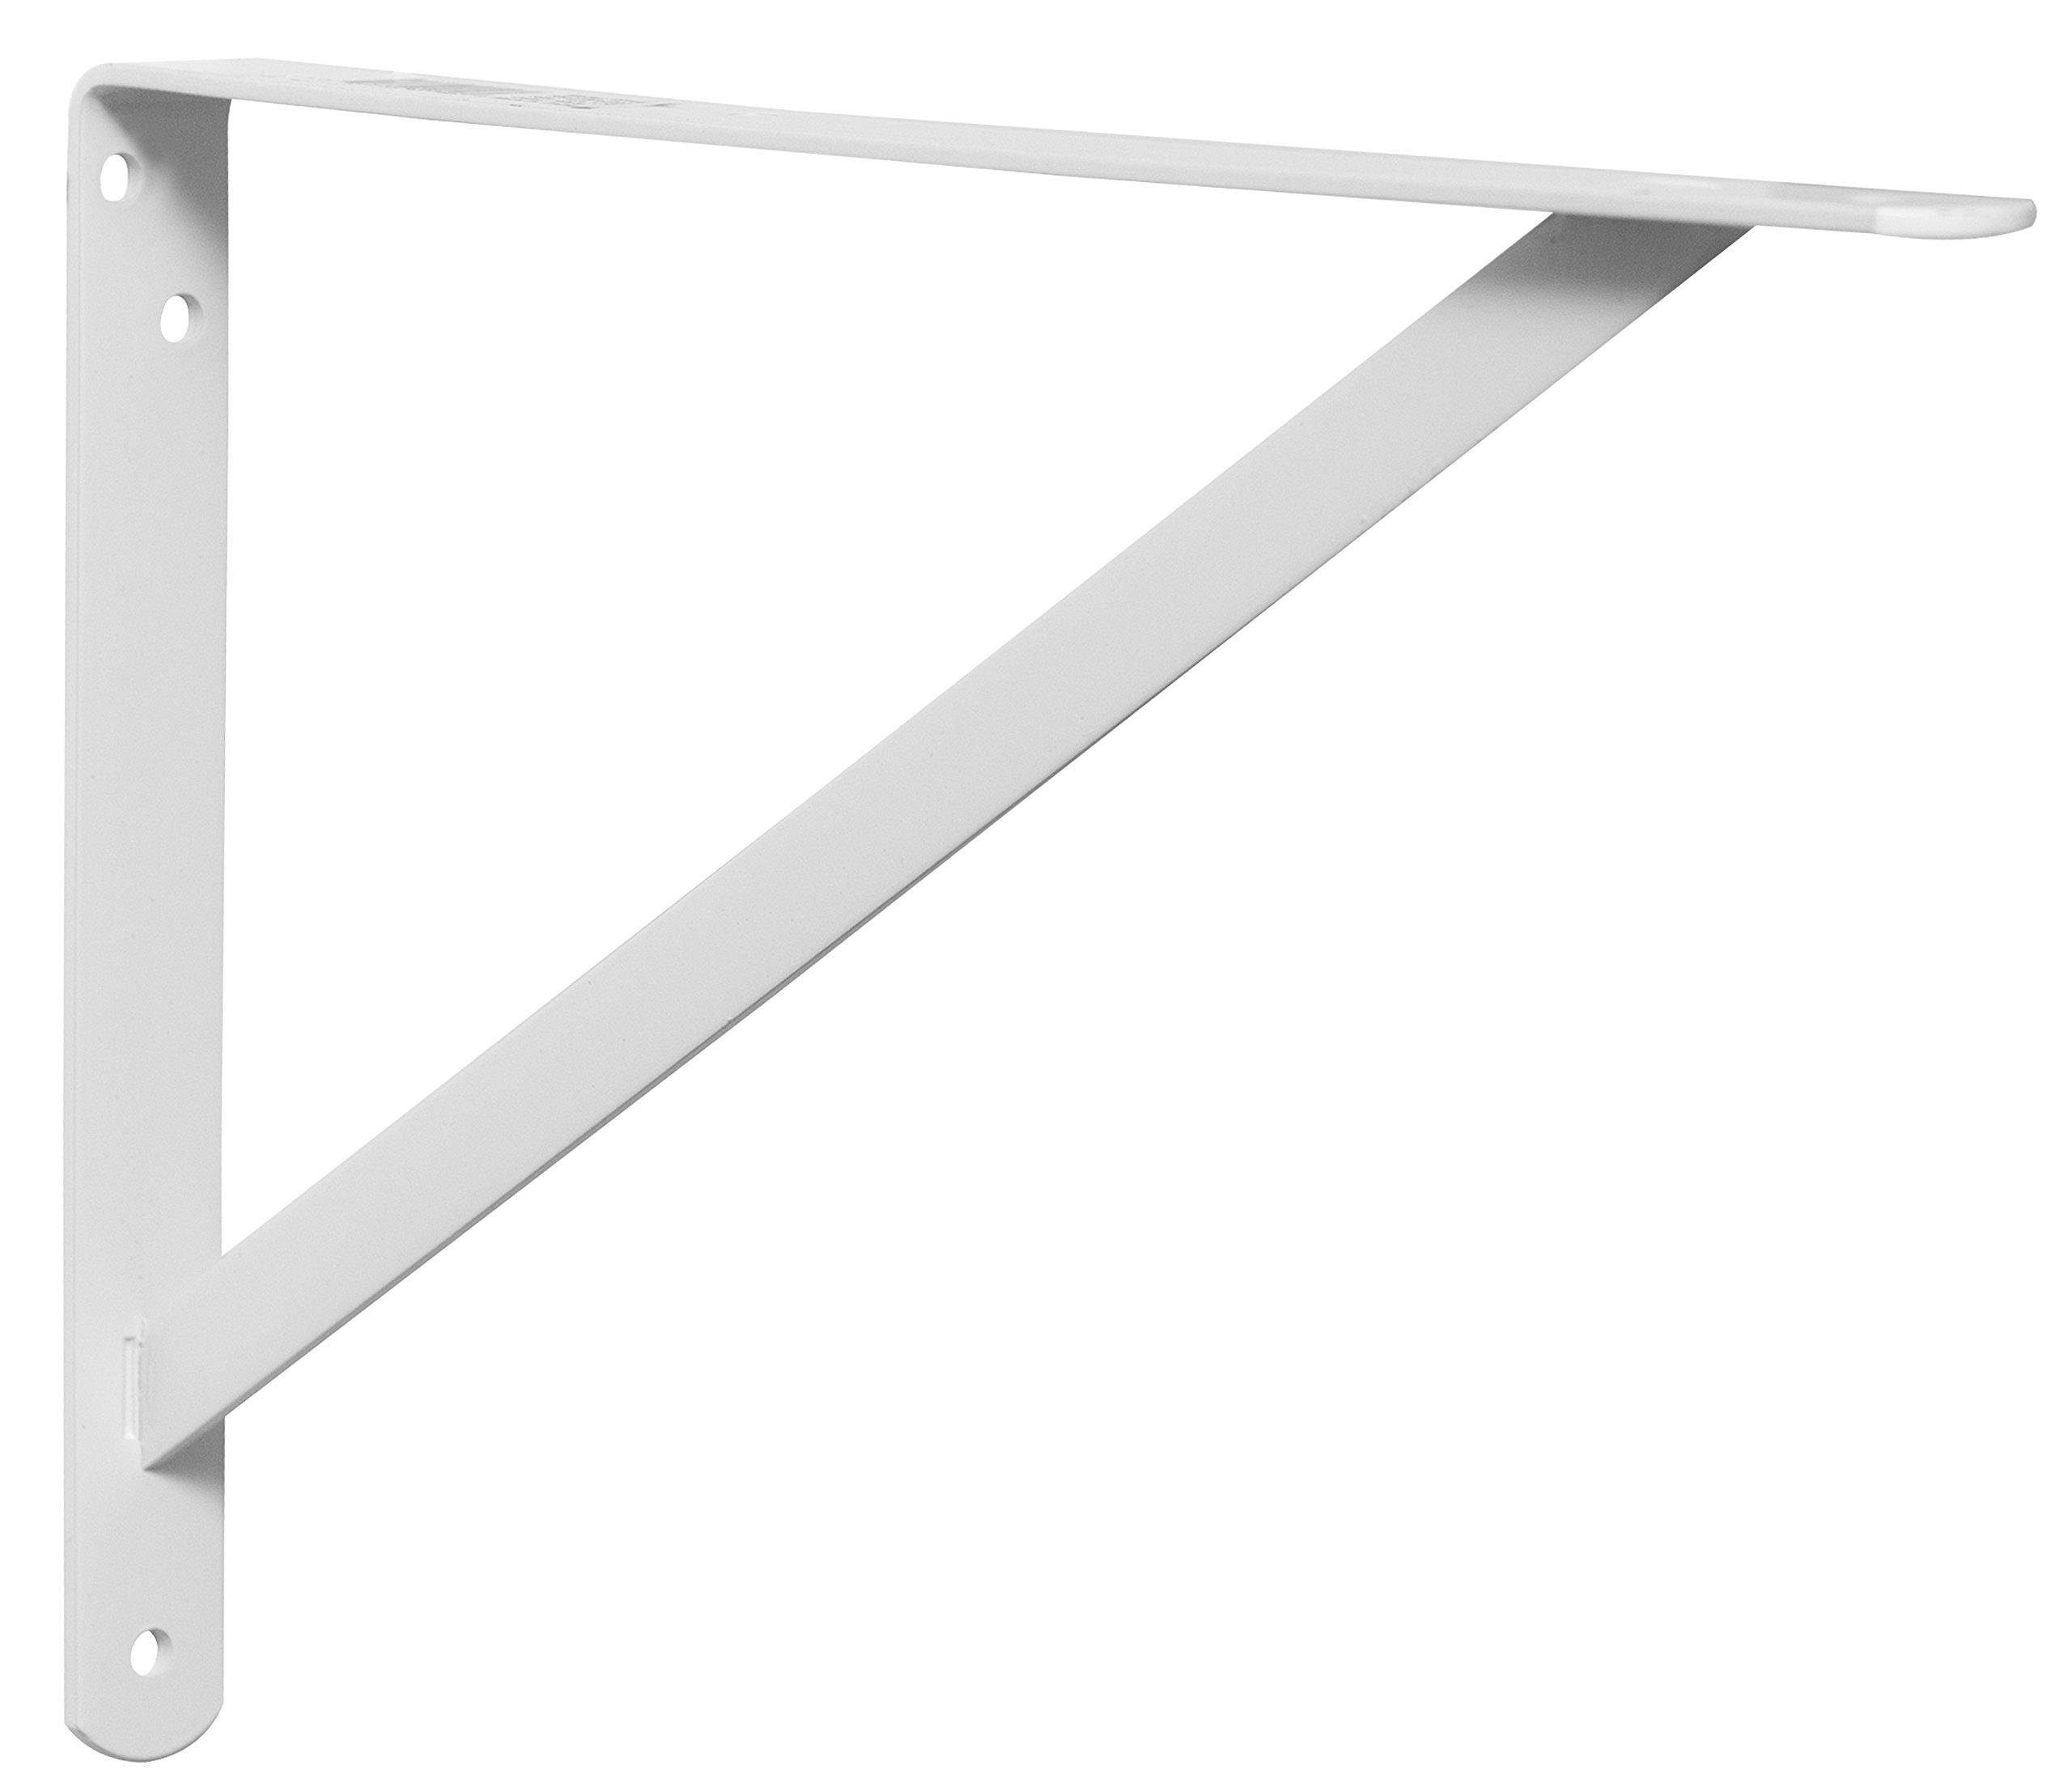 Decko 49146 Heavy Duty Shelf Bracket, 14.5-Inch by 10-Inch, White, 10-Pack